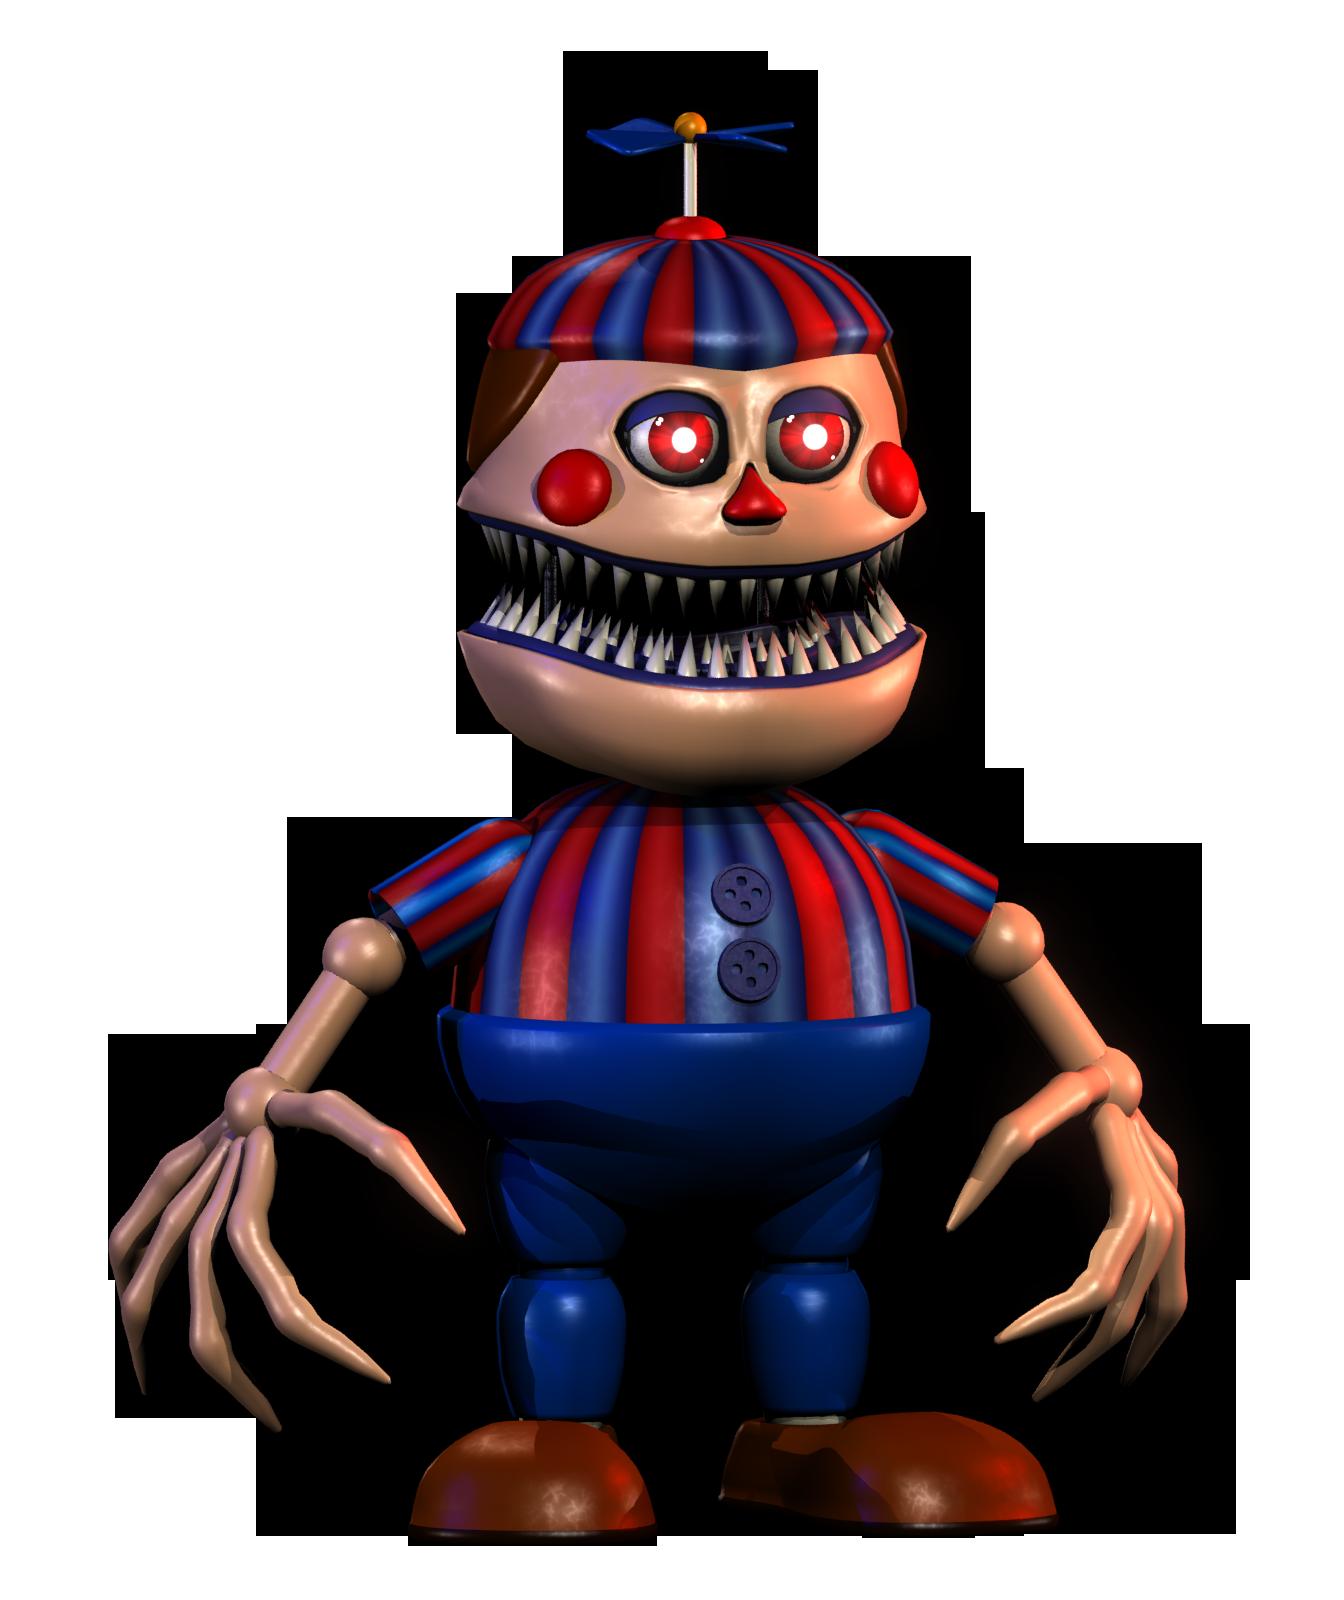 Nightmare Balloon Boy By HectorMKG On DeviantArt